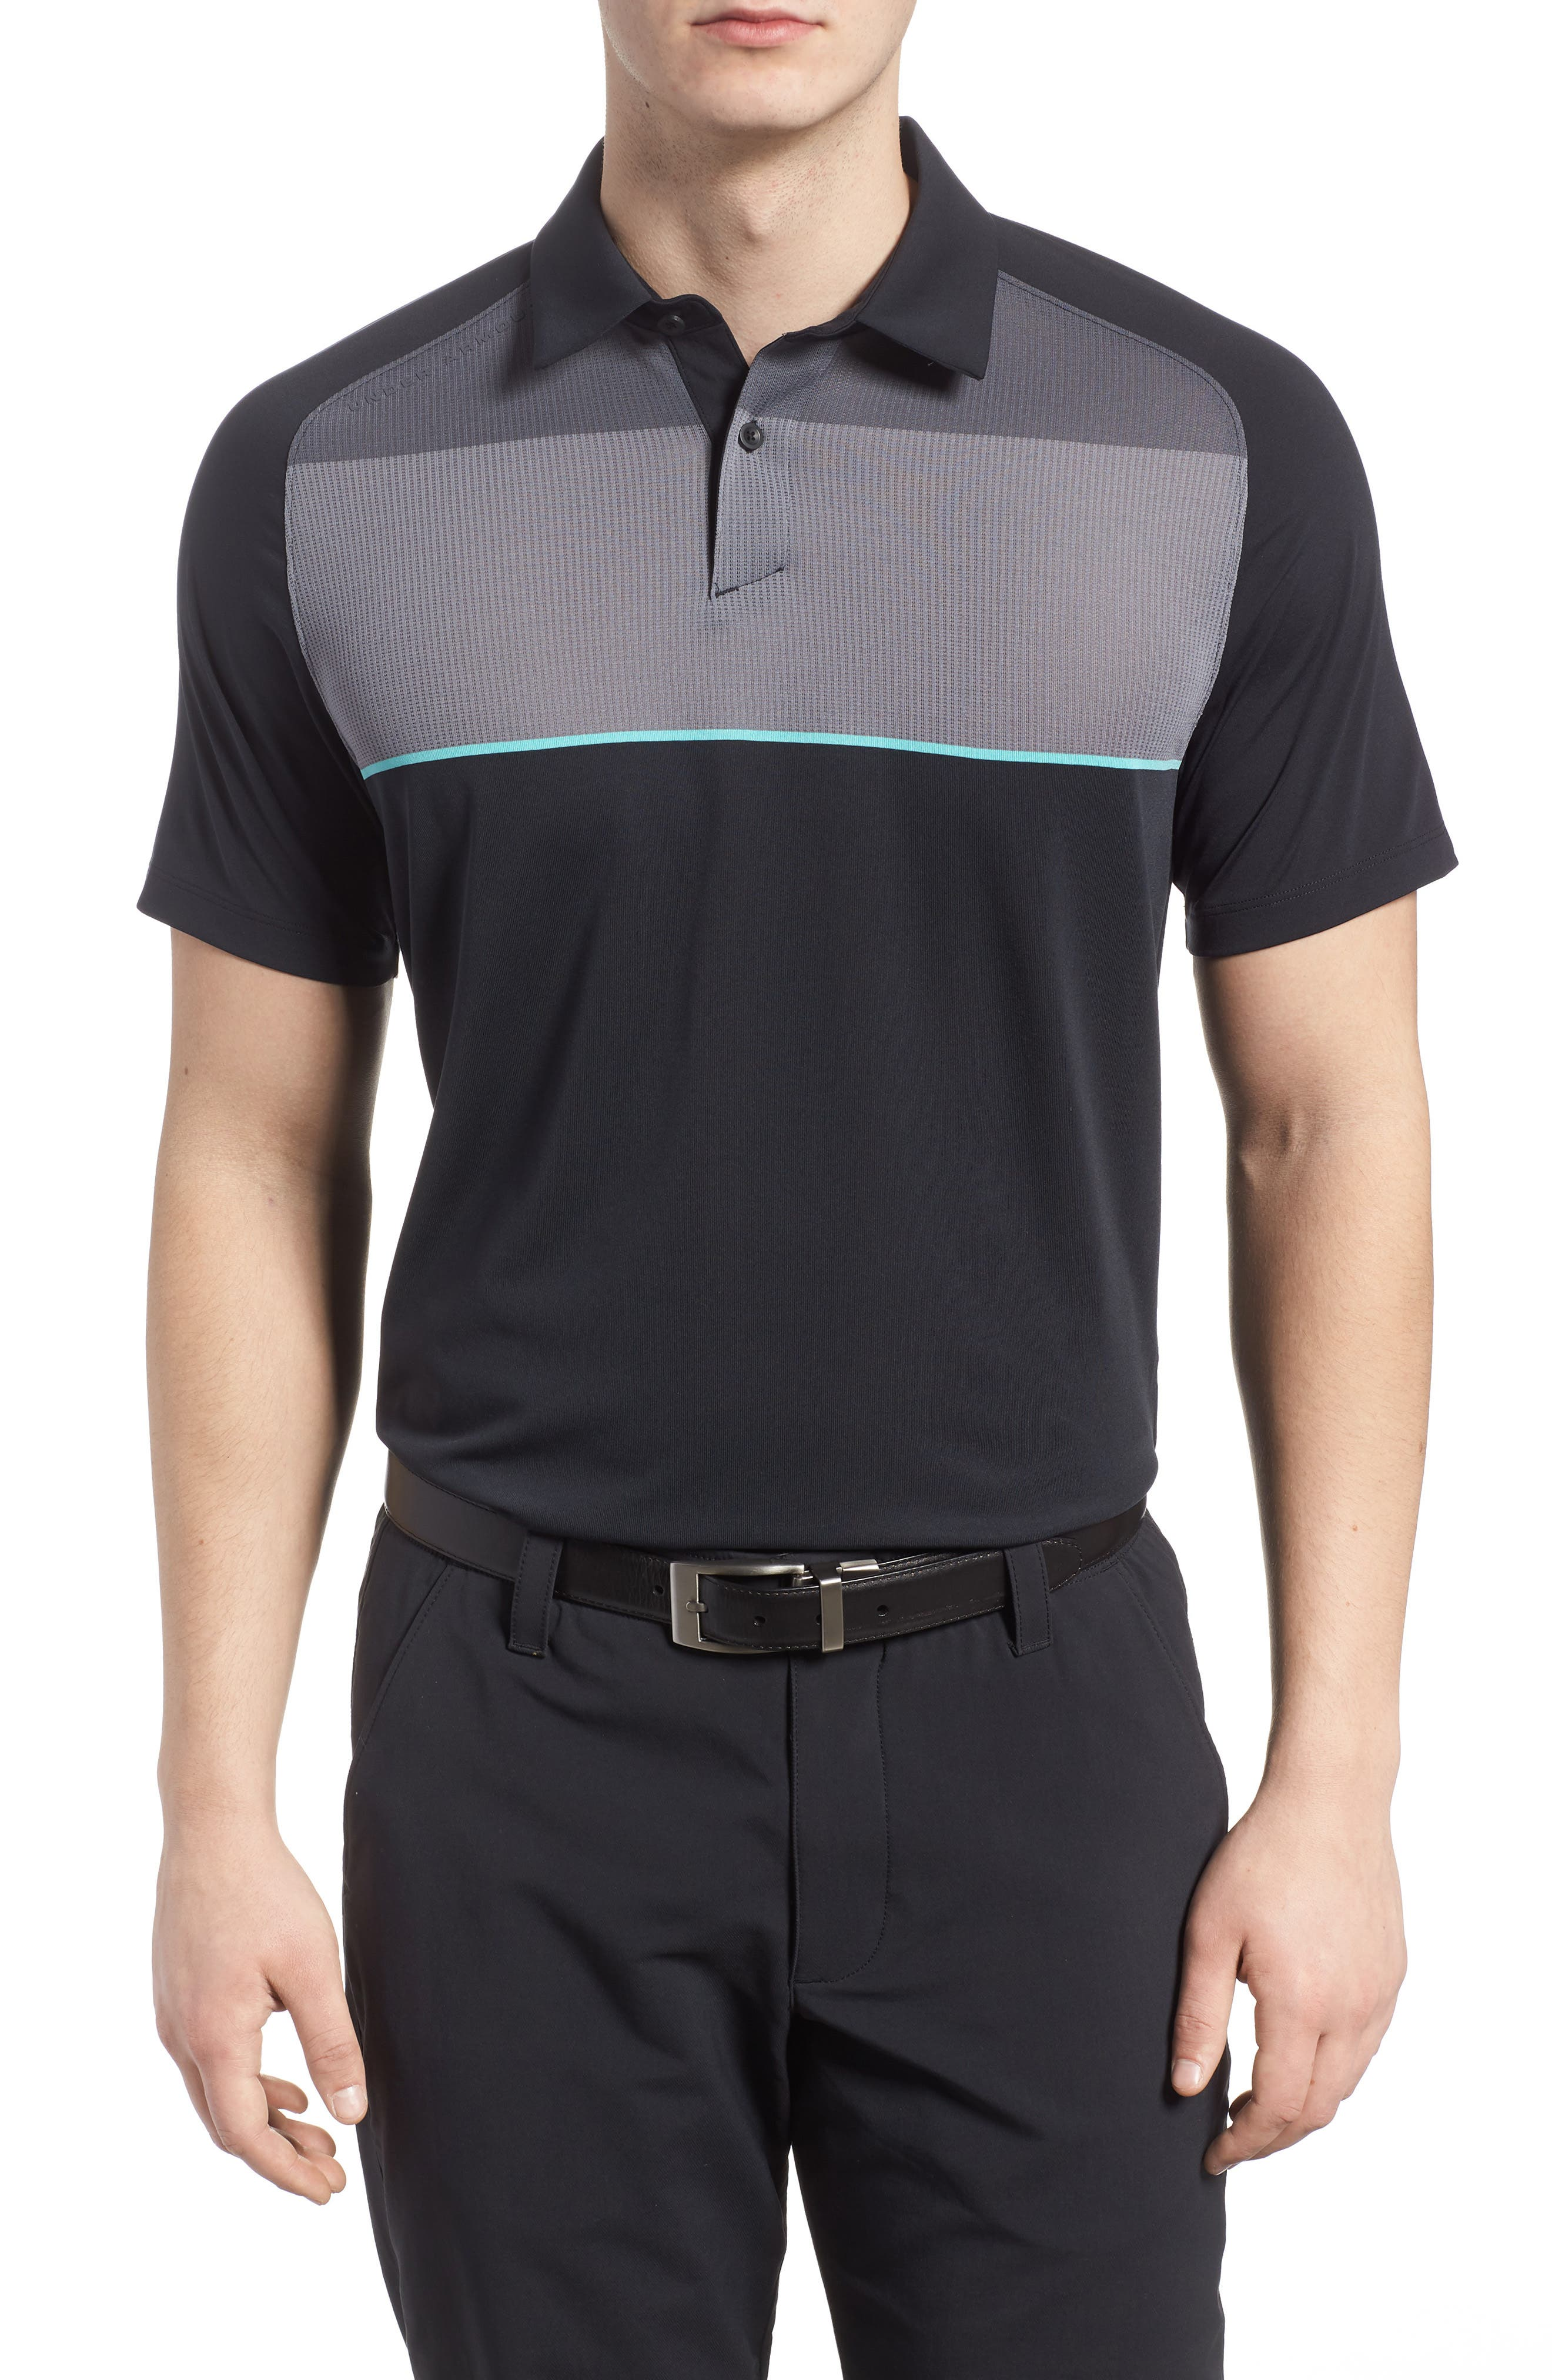 Threadborne Infinite Regular Fit Polo Shirt,                             Main thumbnail 1, color,                             001